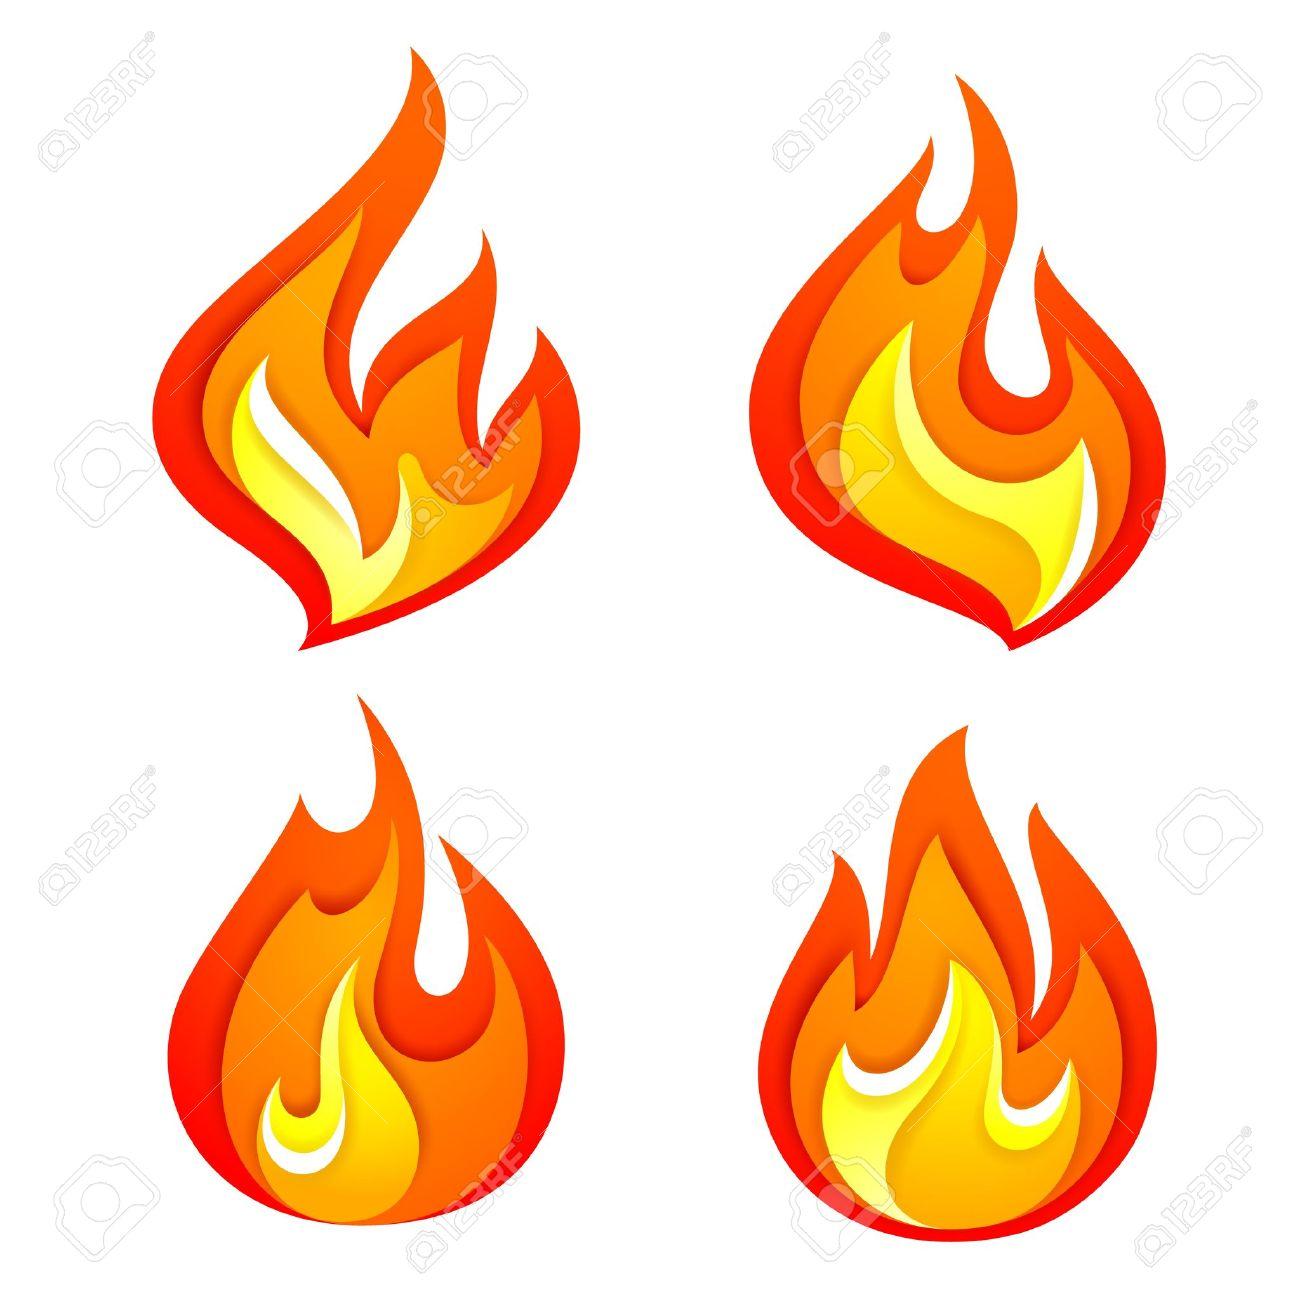 Fire flames Stock Vector - 19731800